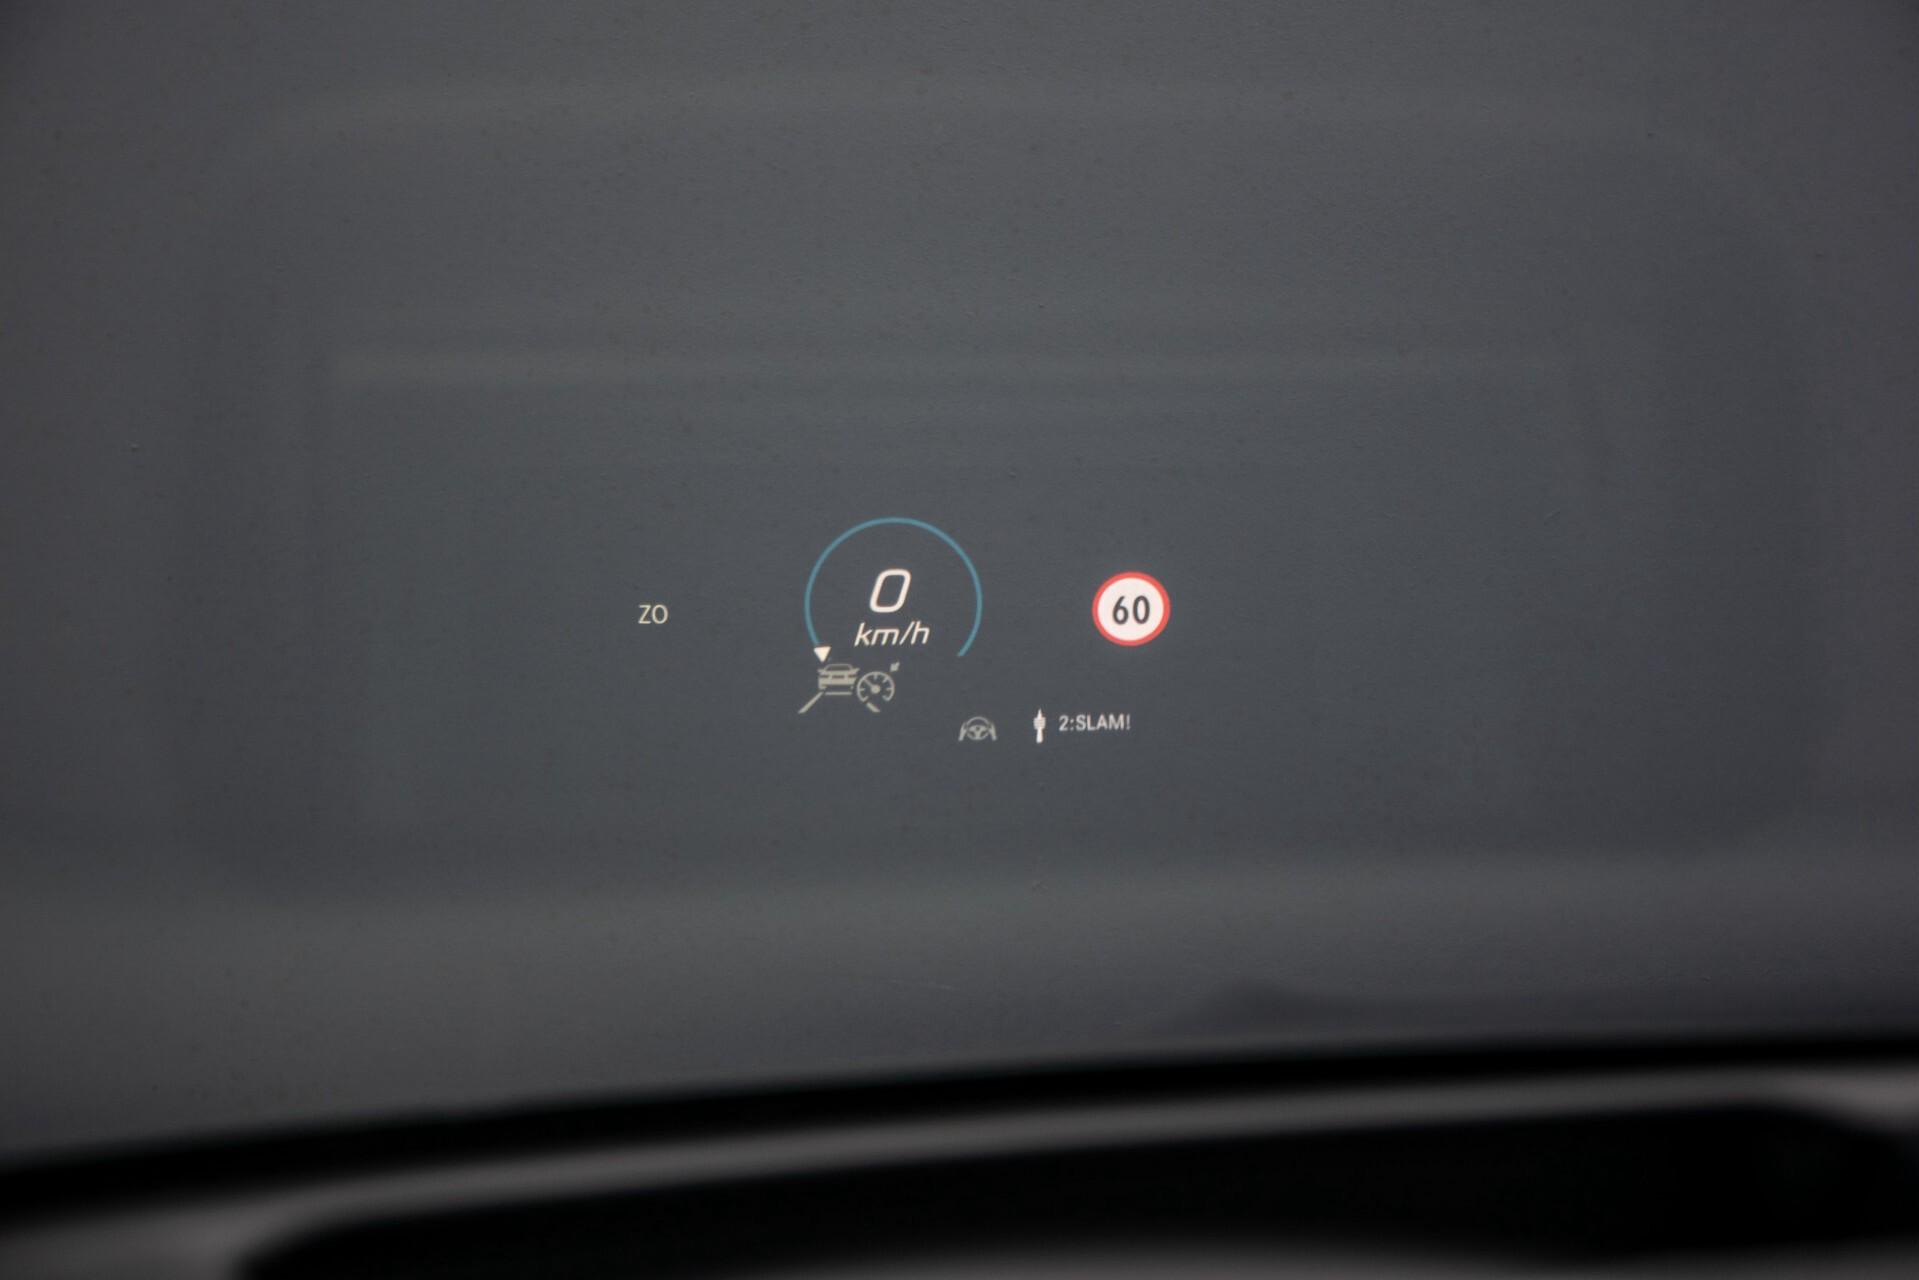 Mercedes-Benz GLE 450 4-M 7-Persoons AMG Massage/Rij-assist/Keyless/TV/360/Night/Trekhaak Aut9 Foto 55